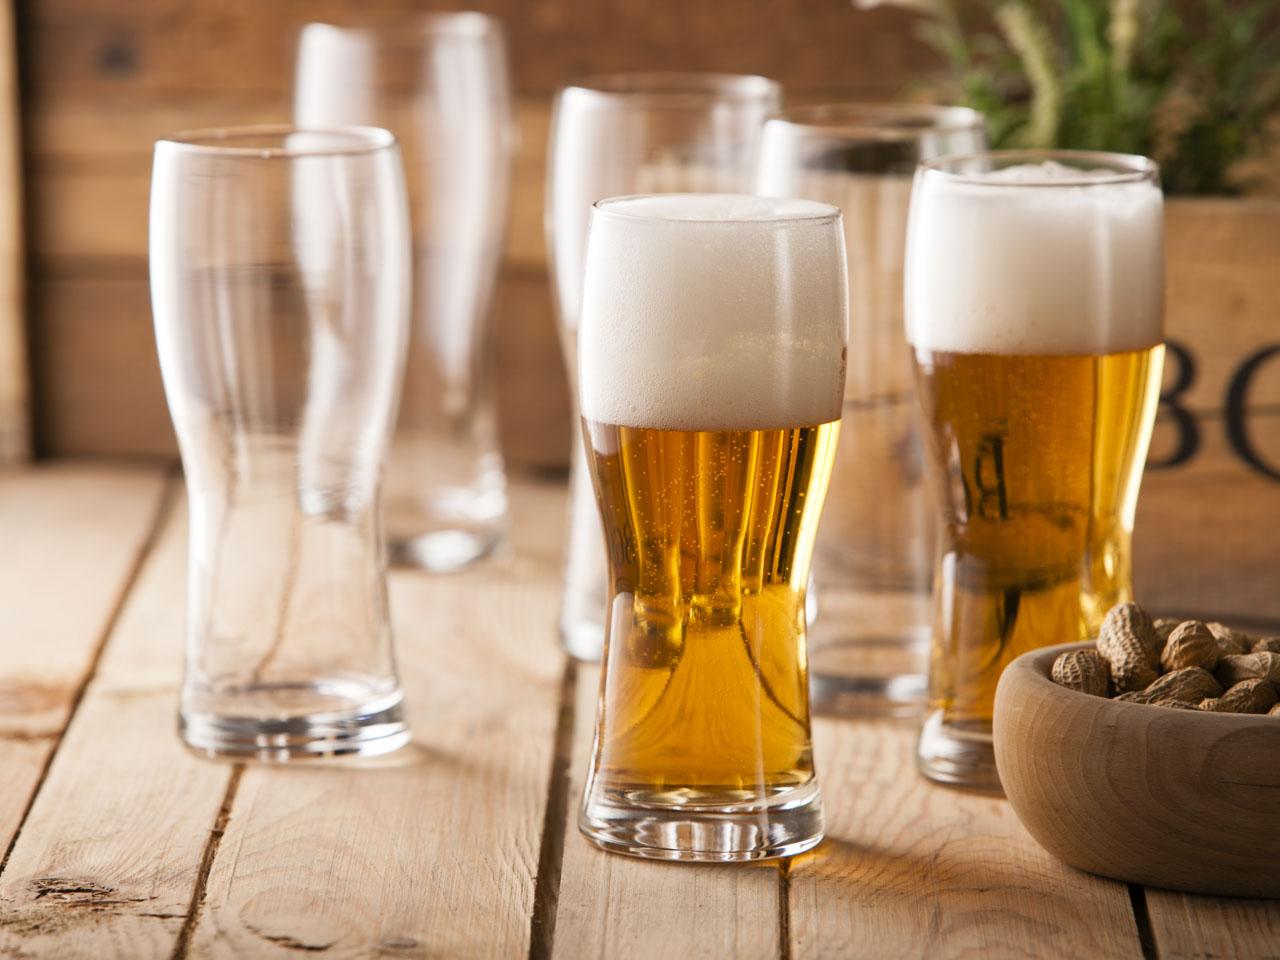 Szklanki / pokale do piwa Praga 500 ml, komplet 6 szt.